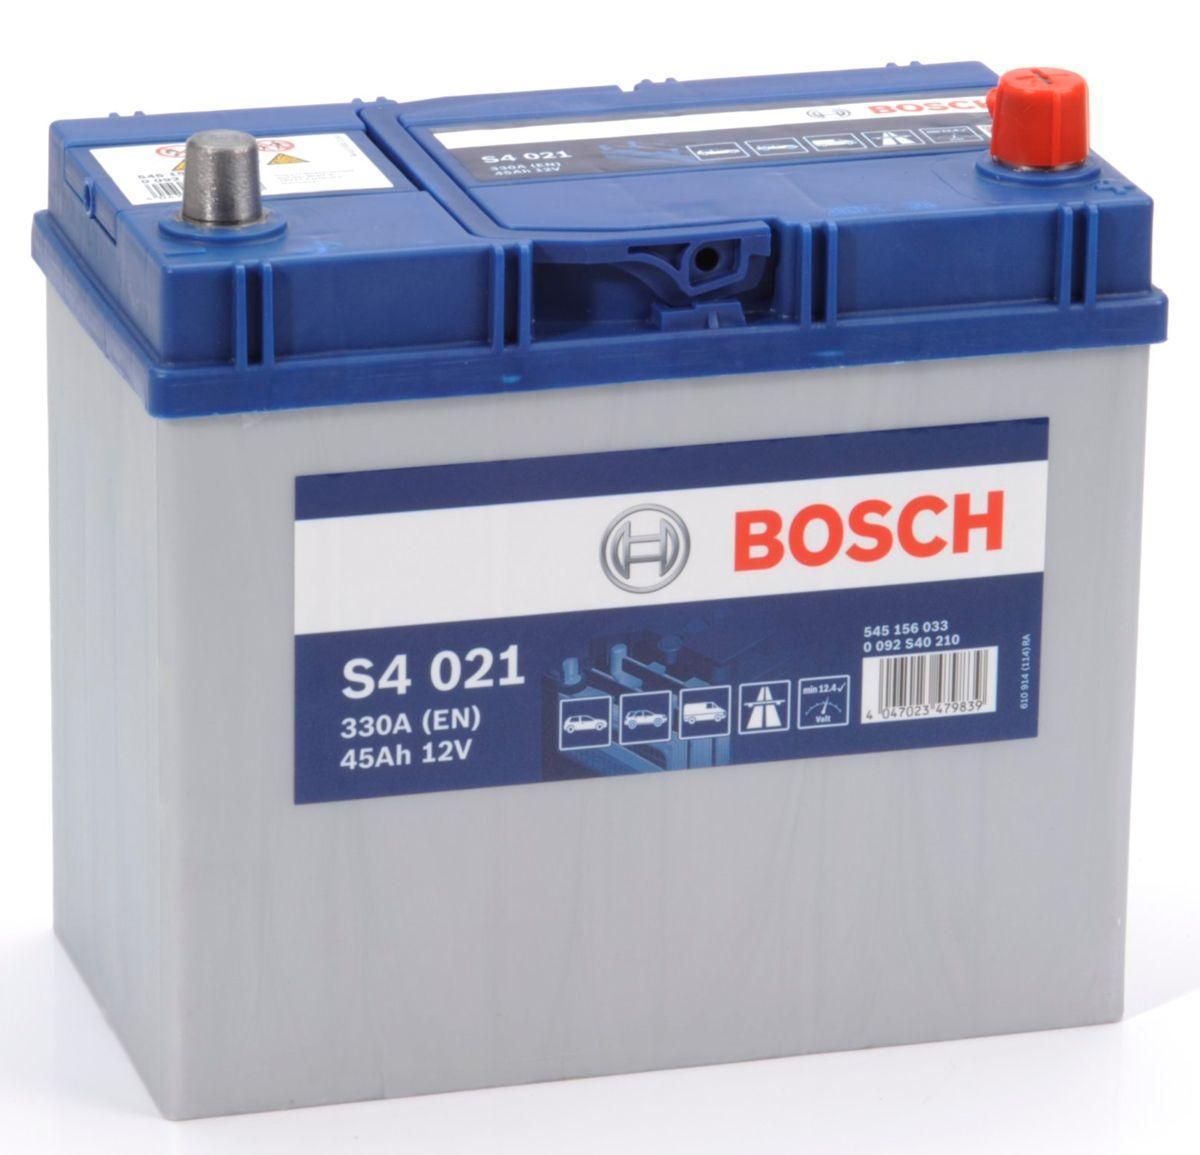 Аккумулятор 6СТ-45A Bosch Asia (S4021), 12V, 45Ah (-/+) Бош азия евро, 12В, 45Ач, EN330А